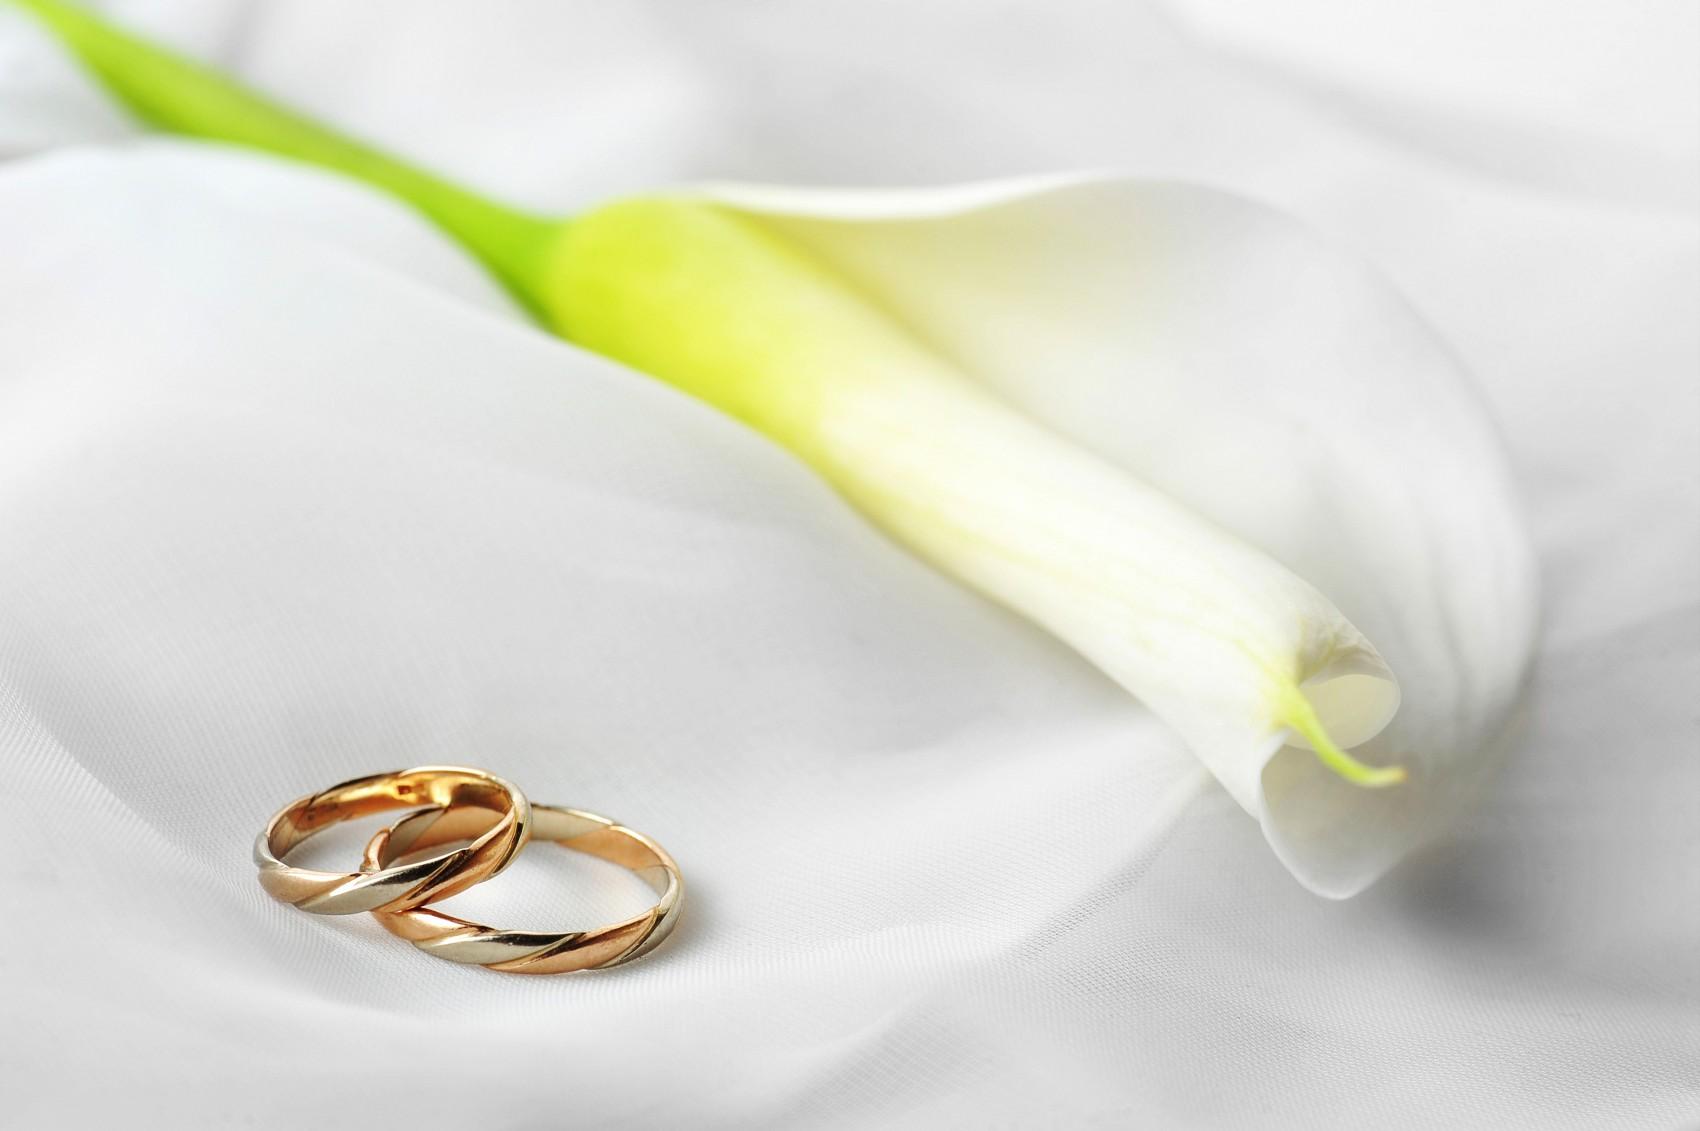 most elegant wedding rings elegant wedding rings Most Elegant Wedding Ring 2